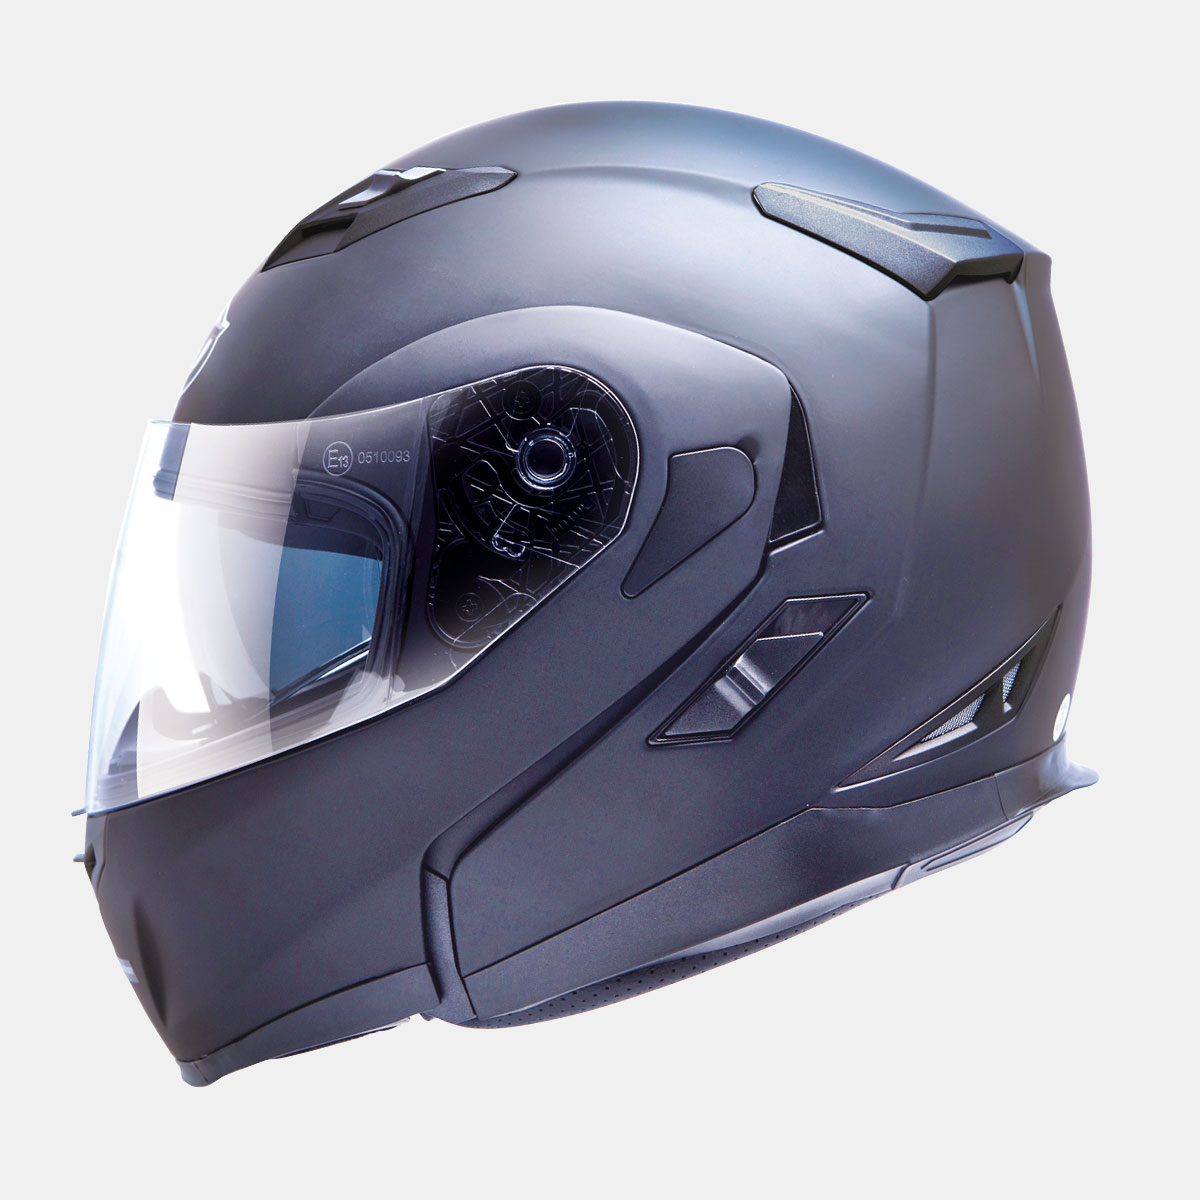 Ando buscando un casco  File-11-11-2015-10-18-49-fqxSZi